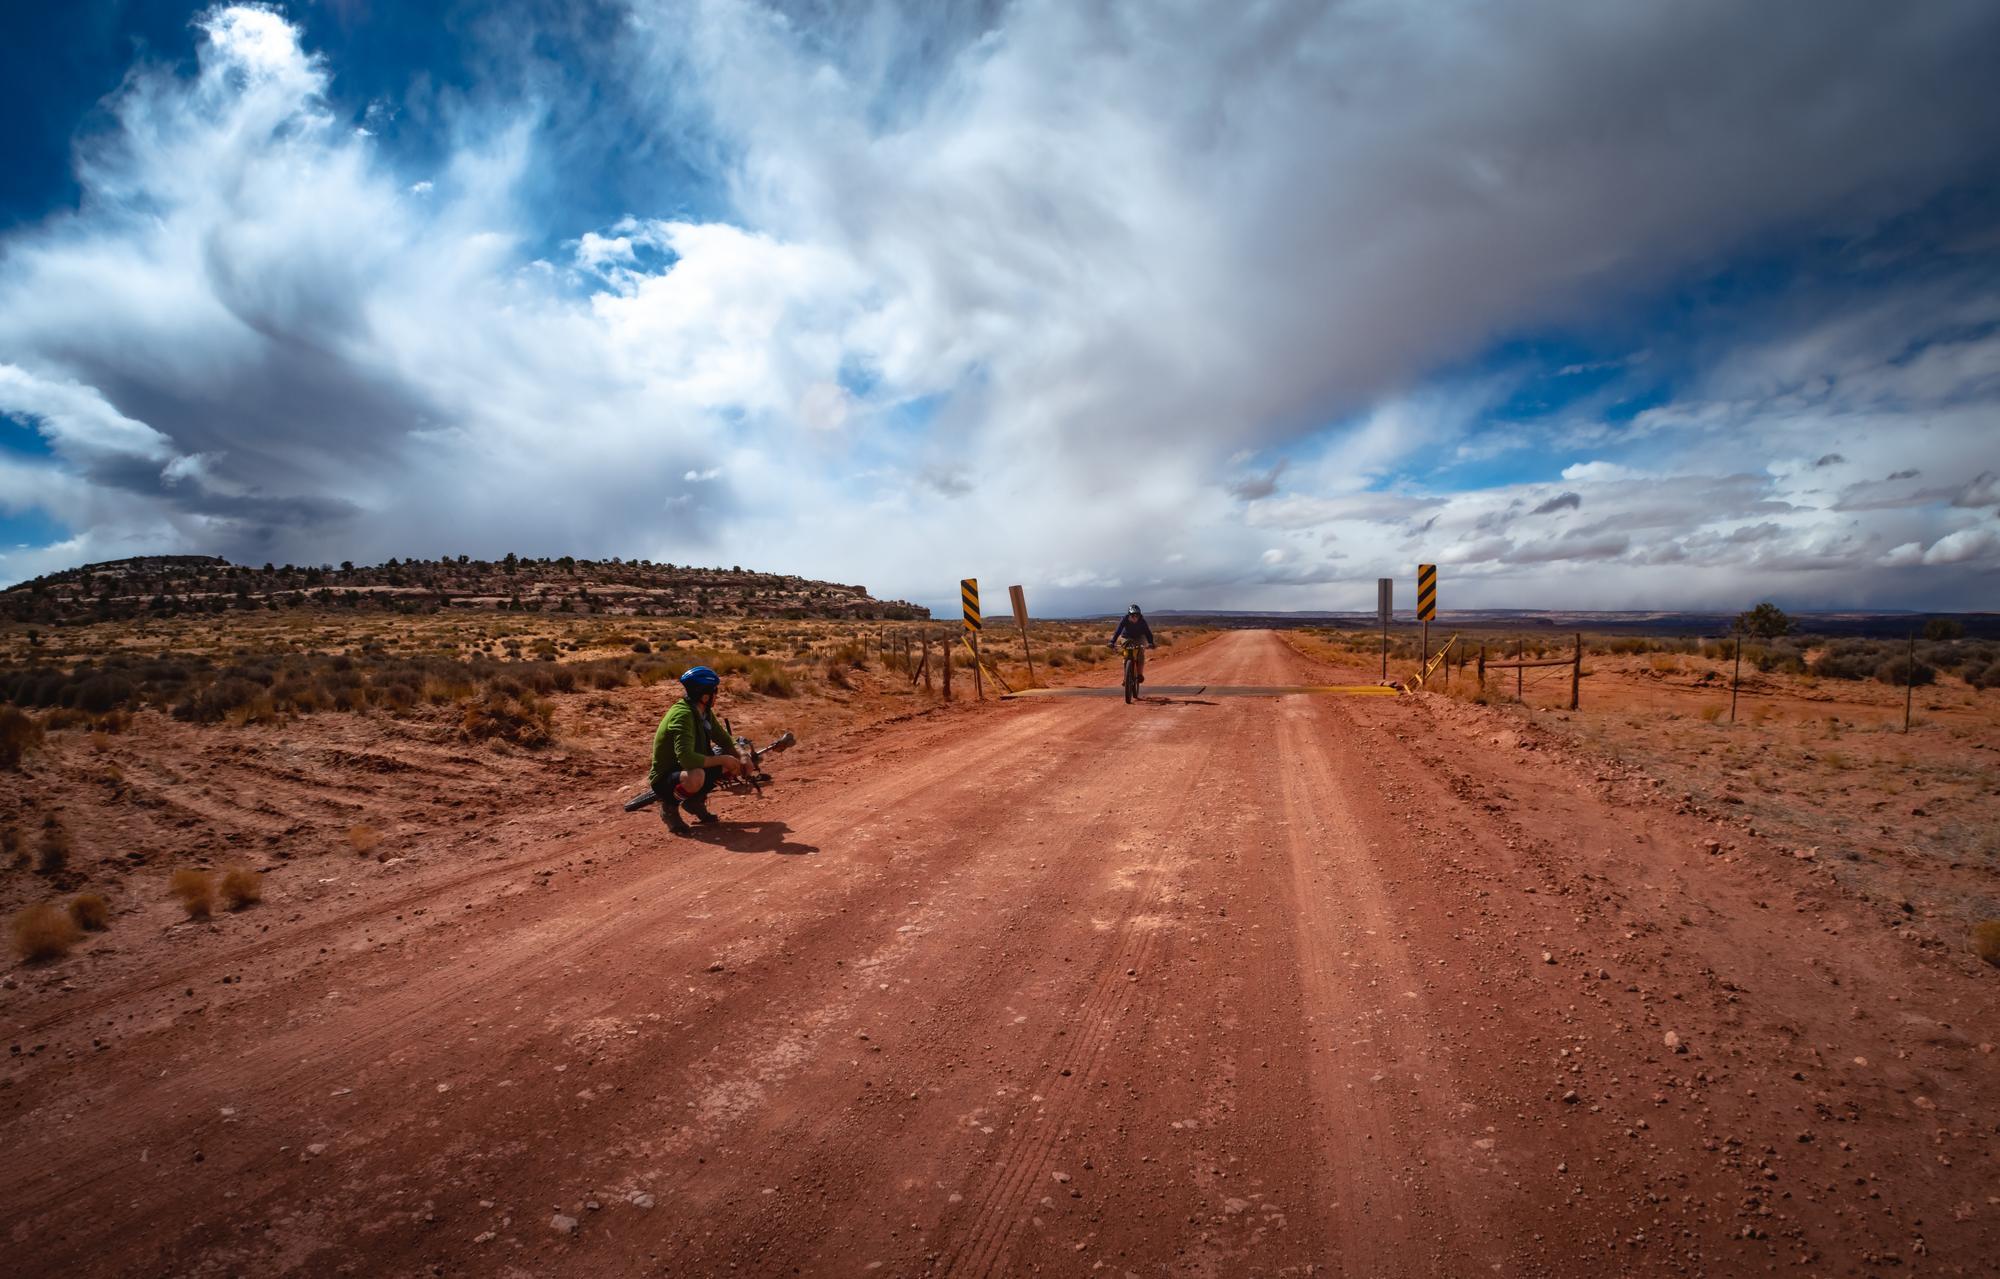 Bikepacking The White Rim Trail: Touching the World Again